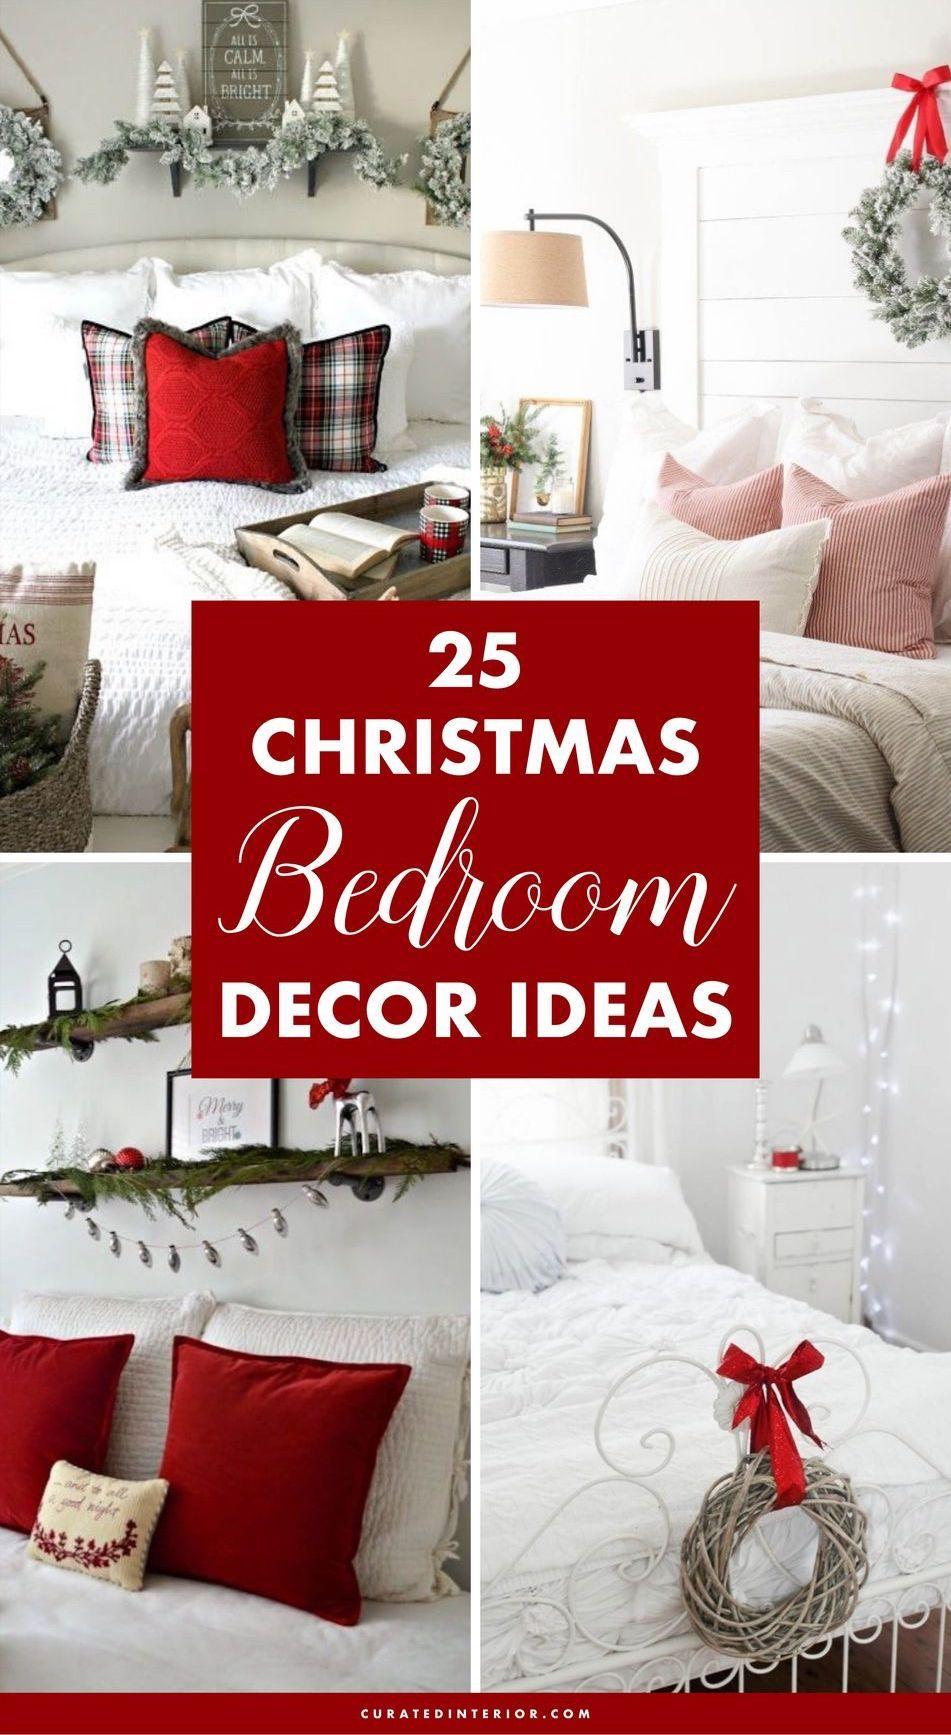 25 Christmas Bedroom Decor Ideas For A Cozy Holiday Bedroom Christmas Decorations Bedroom Christmas Room Decor Holiday Bedroom